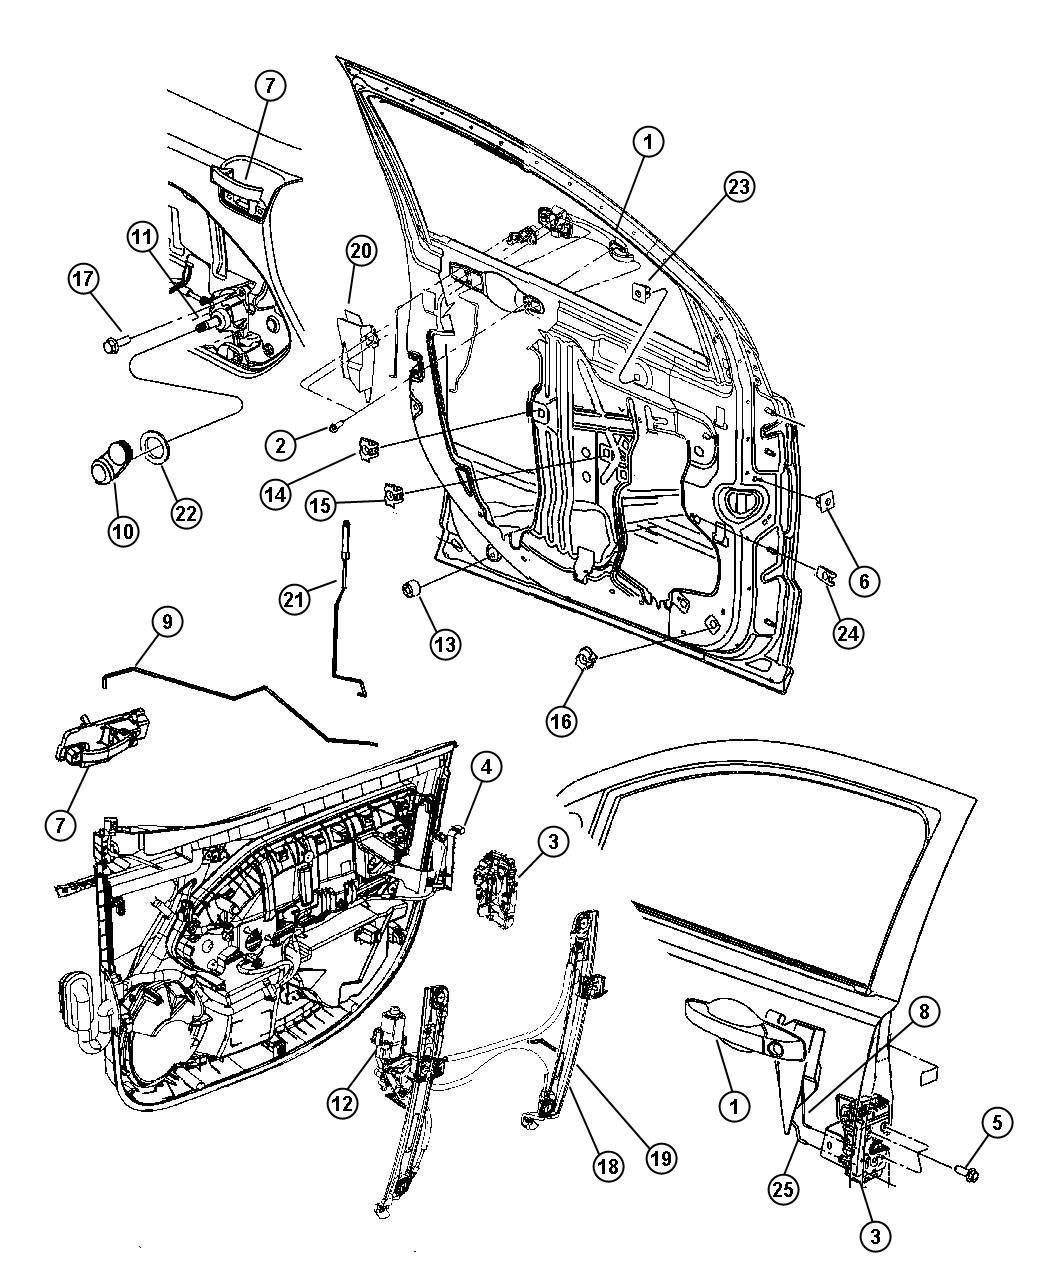 Dodge Caliber Screw. Hex flange head, trim. M6x1.00x50.00